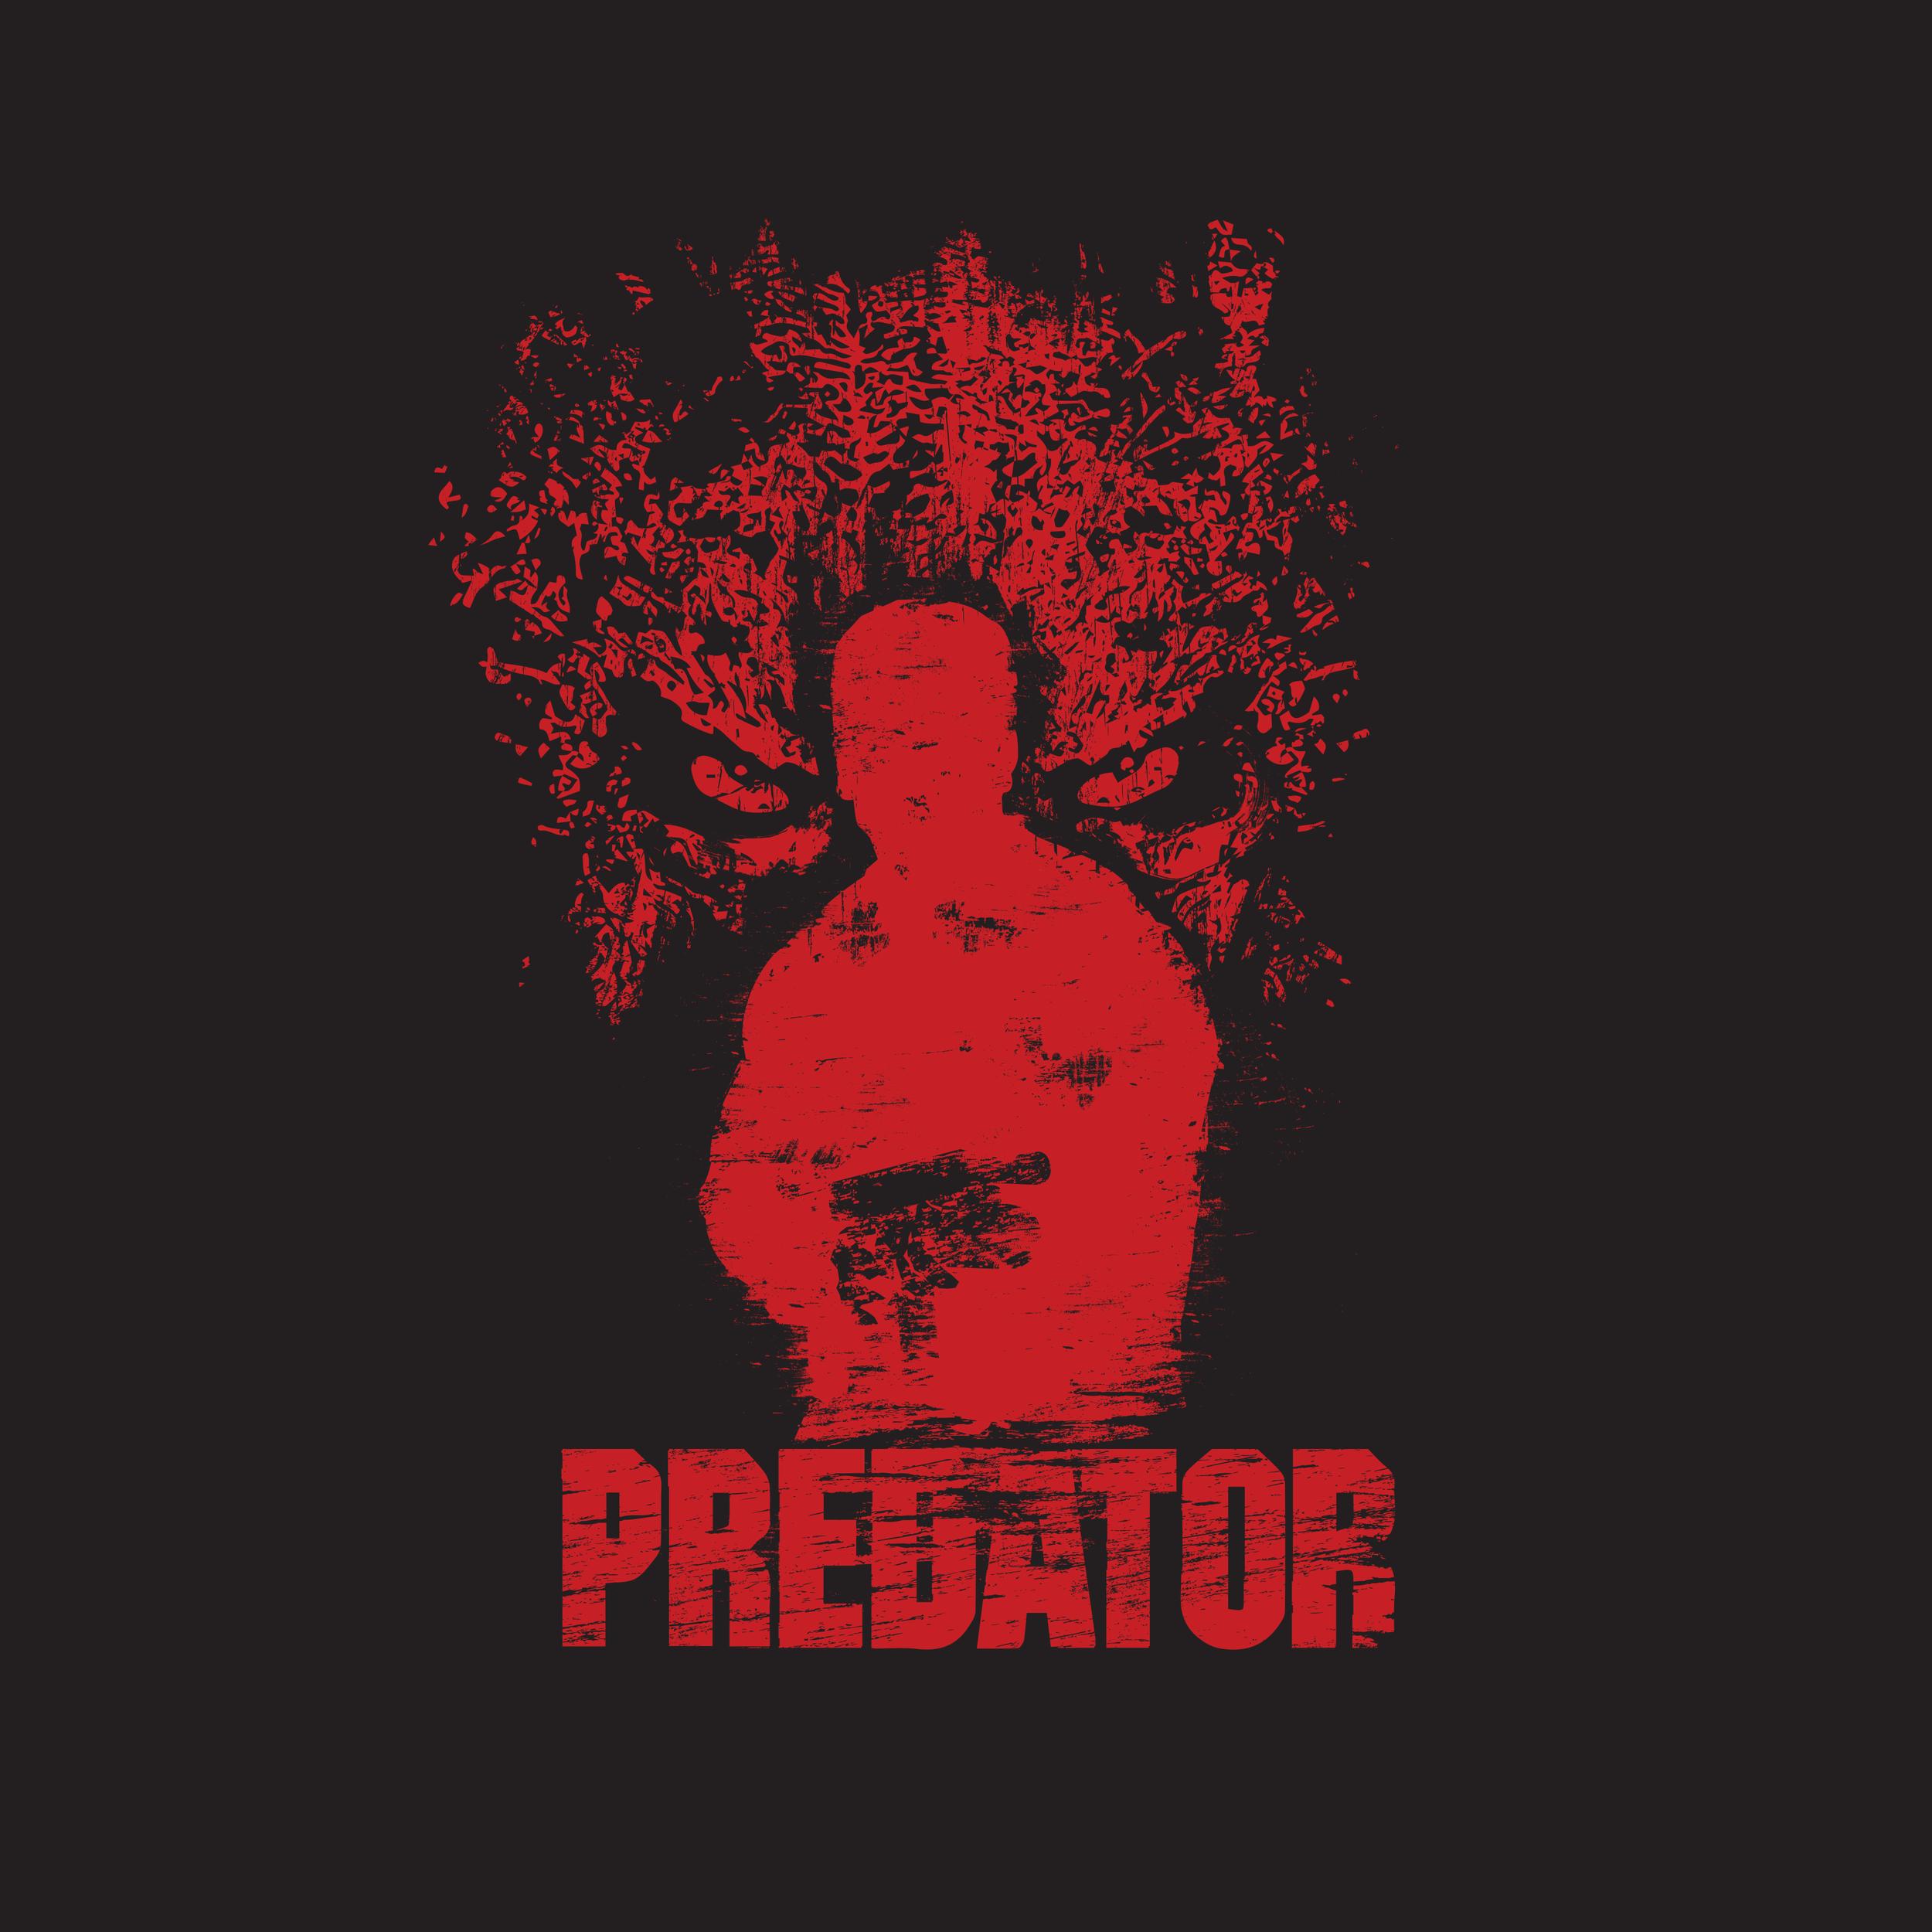 Predator_GR7.png